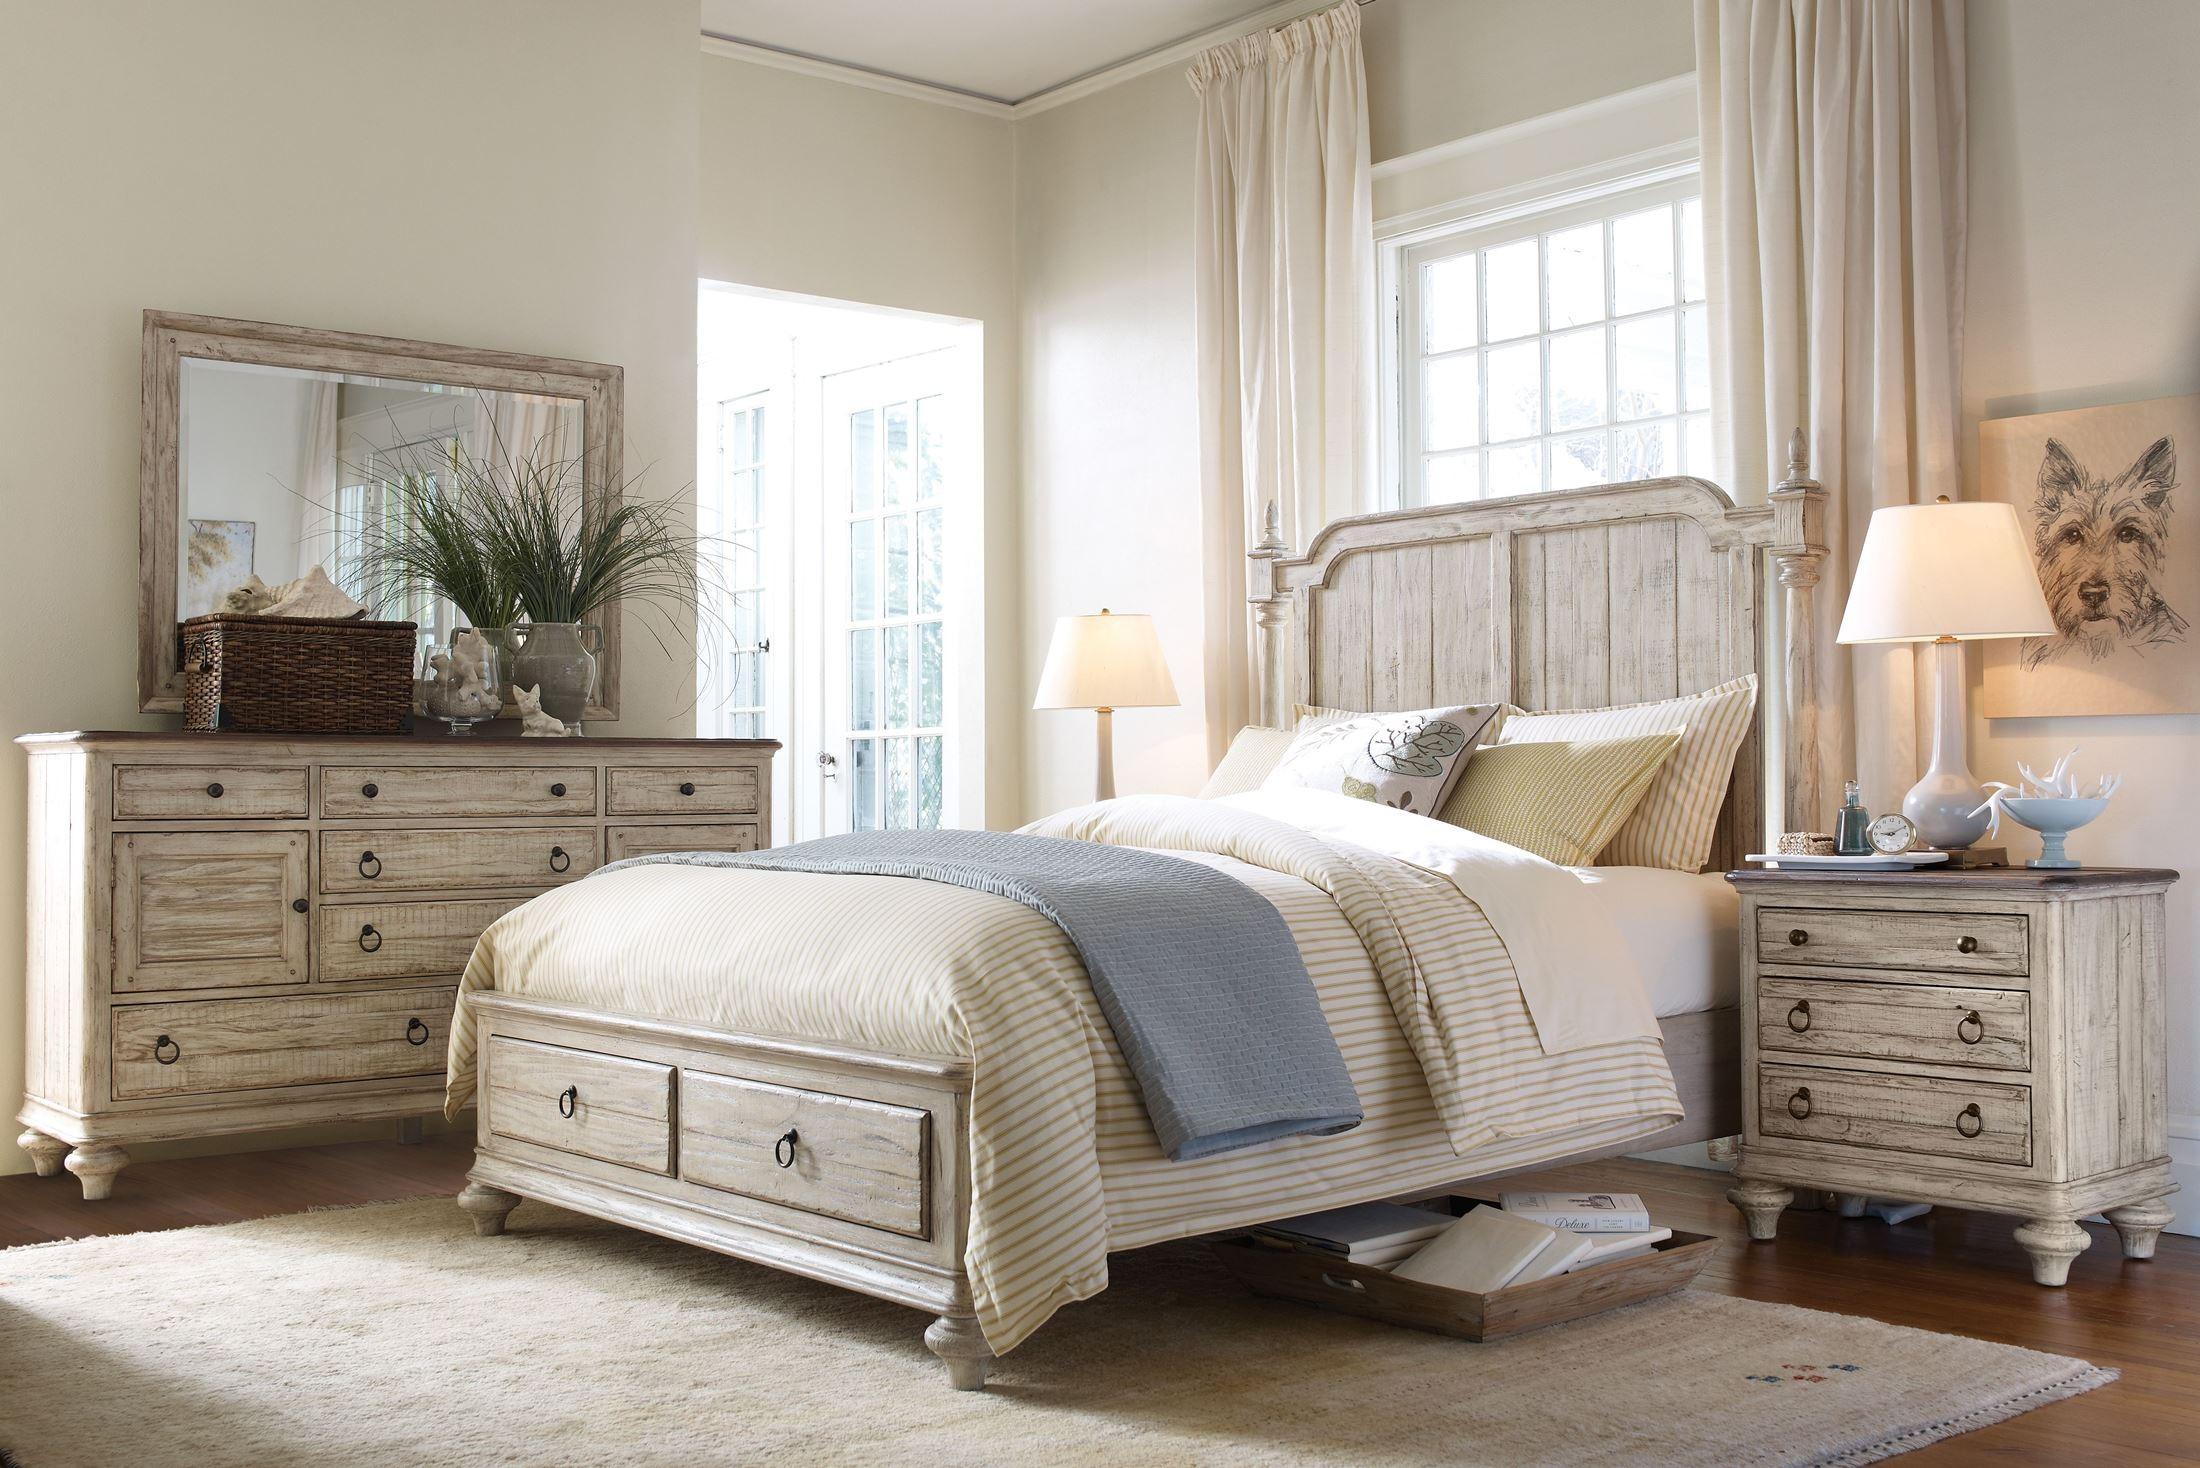 weatherford cornsilk westland storage bedroom set from kincaid furniture coleman furniture. Black Bedroom Furniture Sets. Home Design Ideas